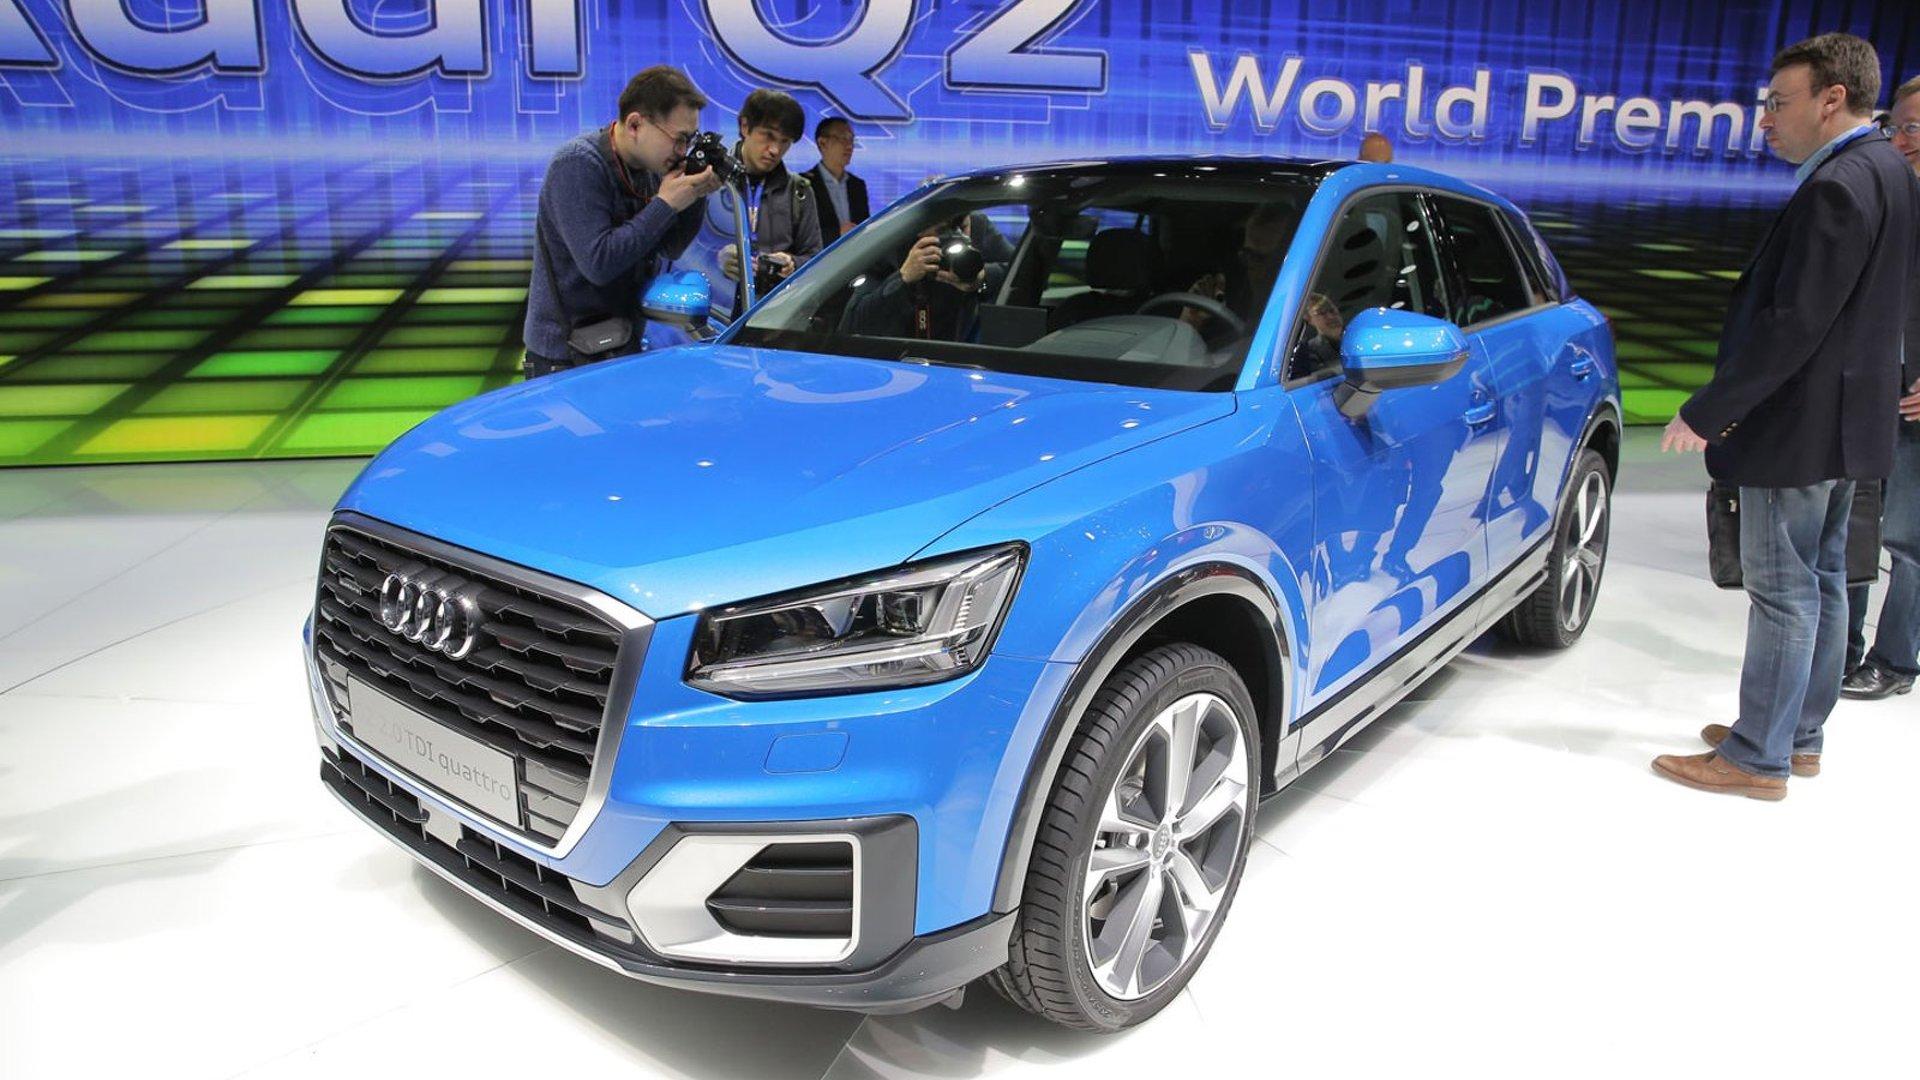 Kekurangan Audi Baby Perbandingan Harga